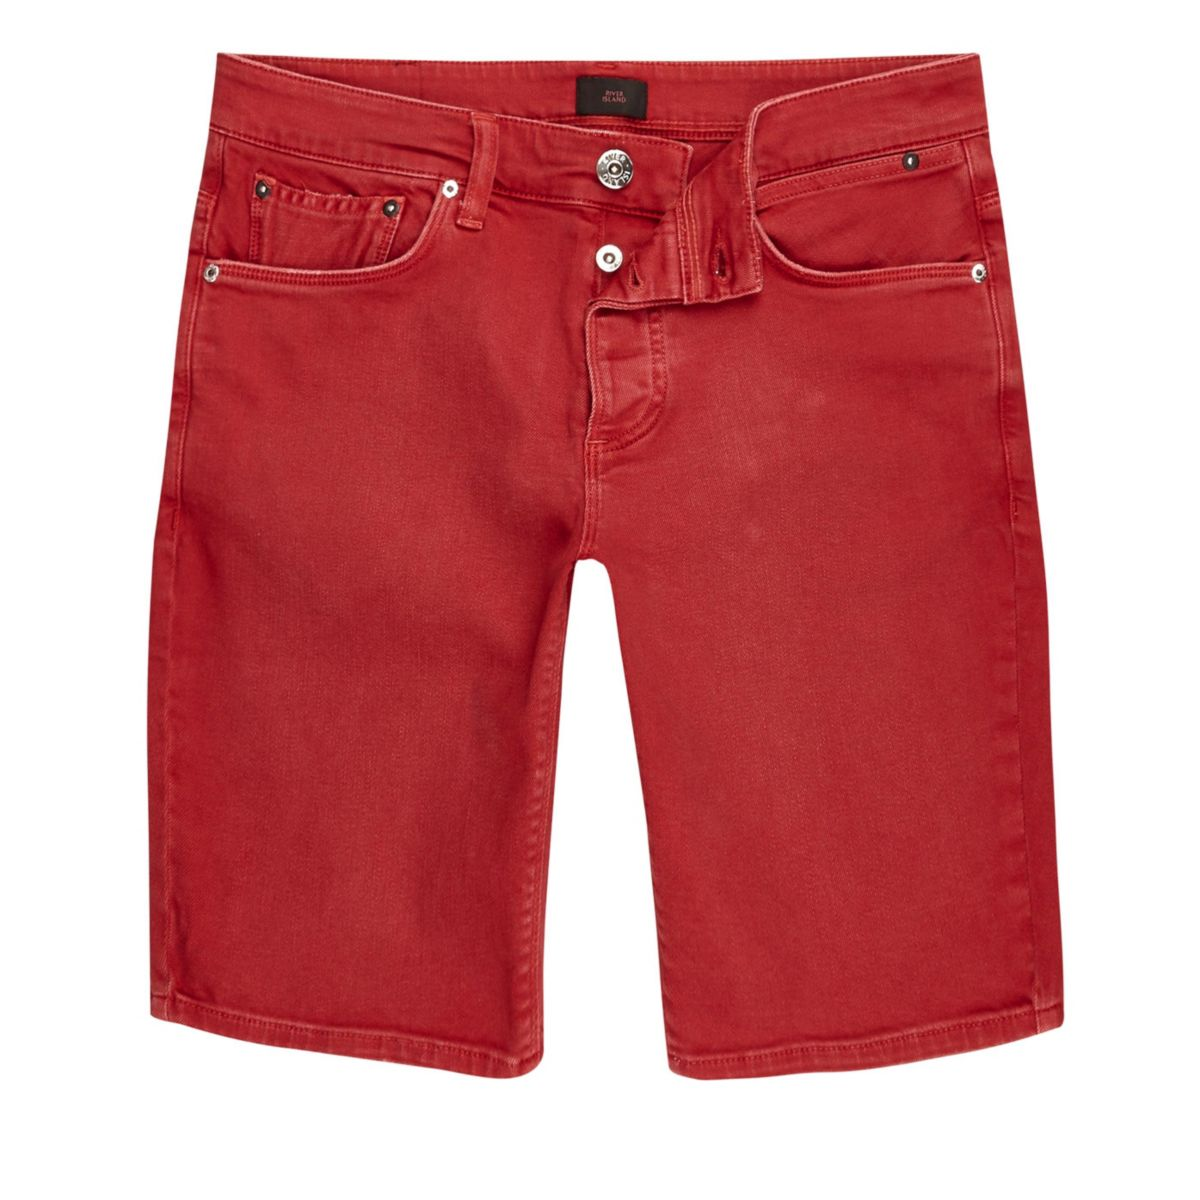 Red skinny fit denim jeans